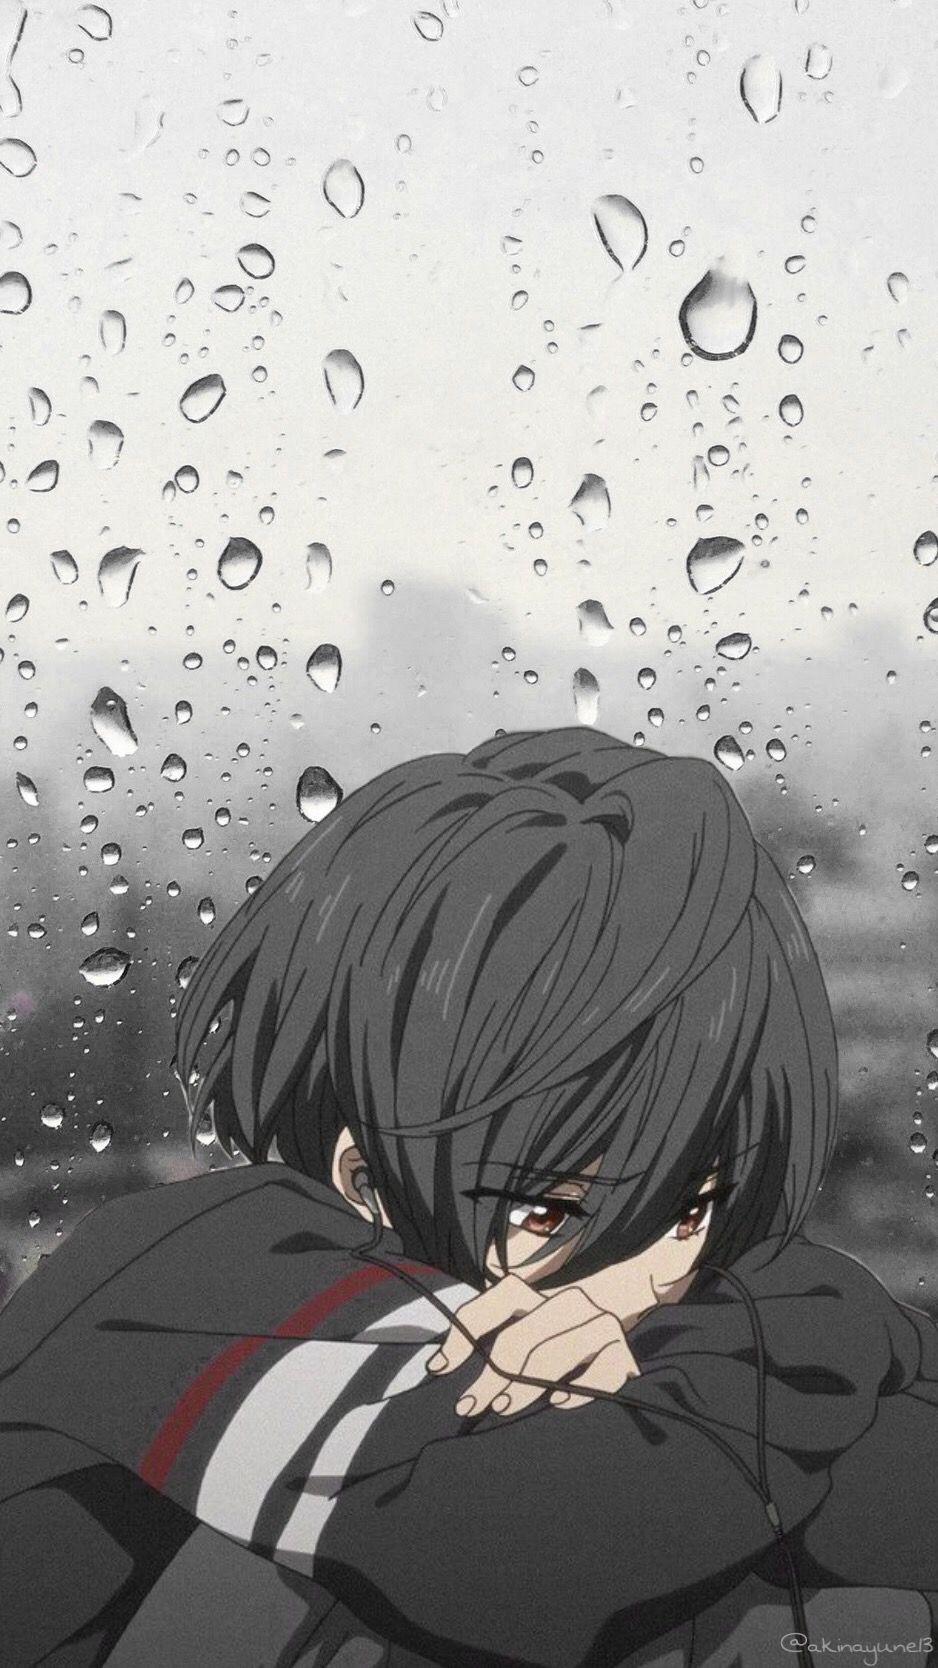 Anime Wallpaper Sad Boy